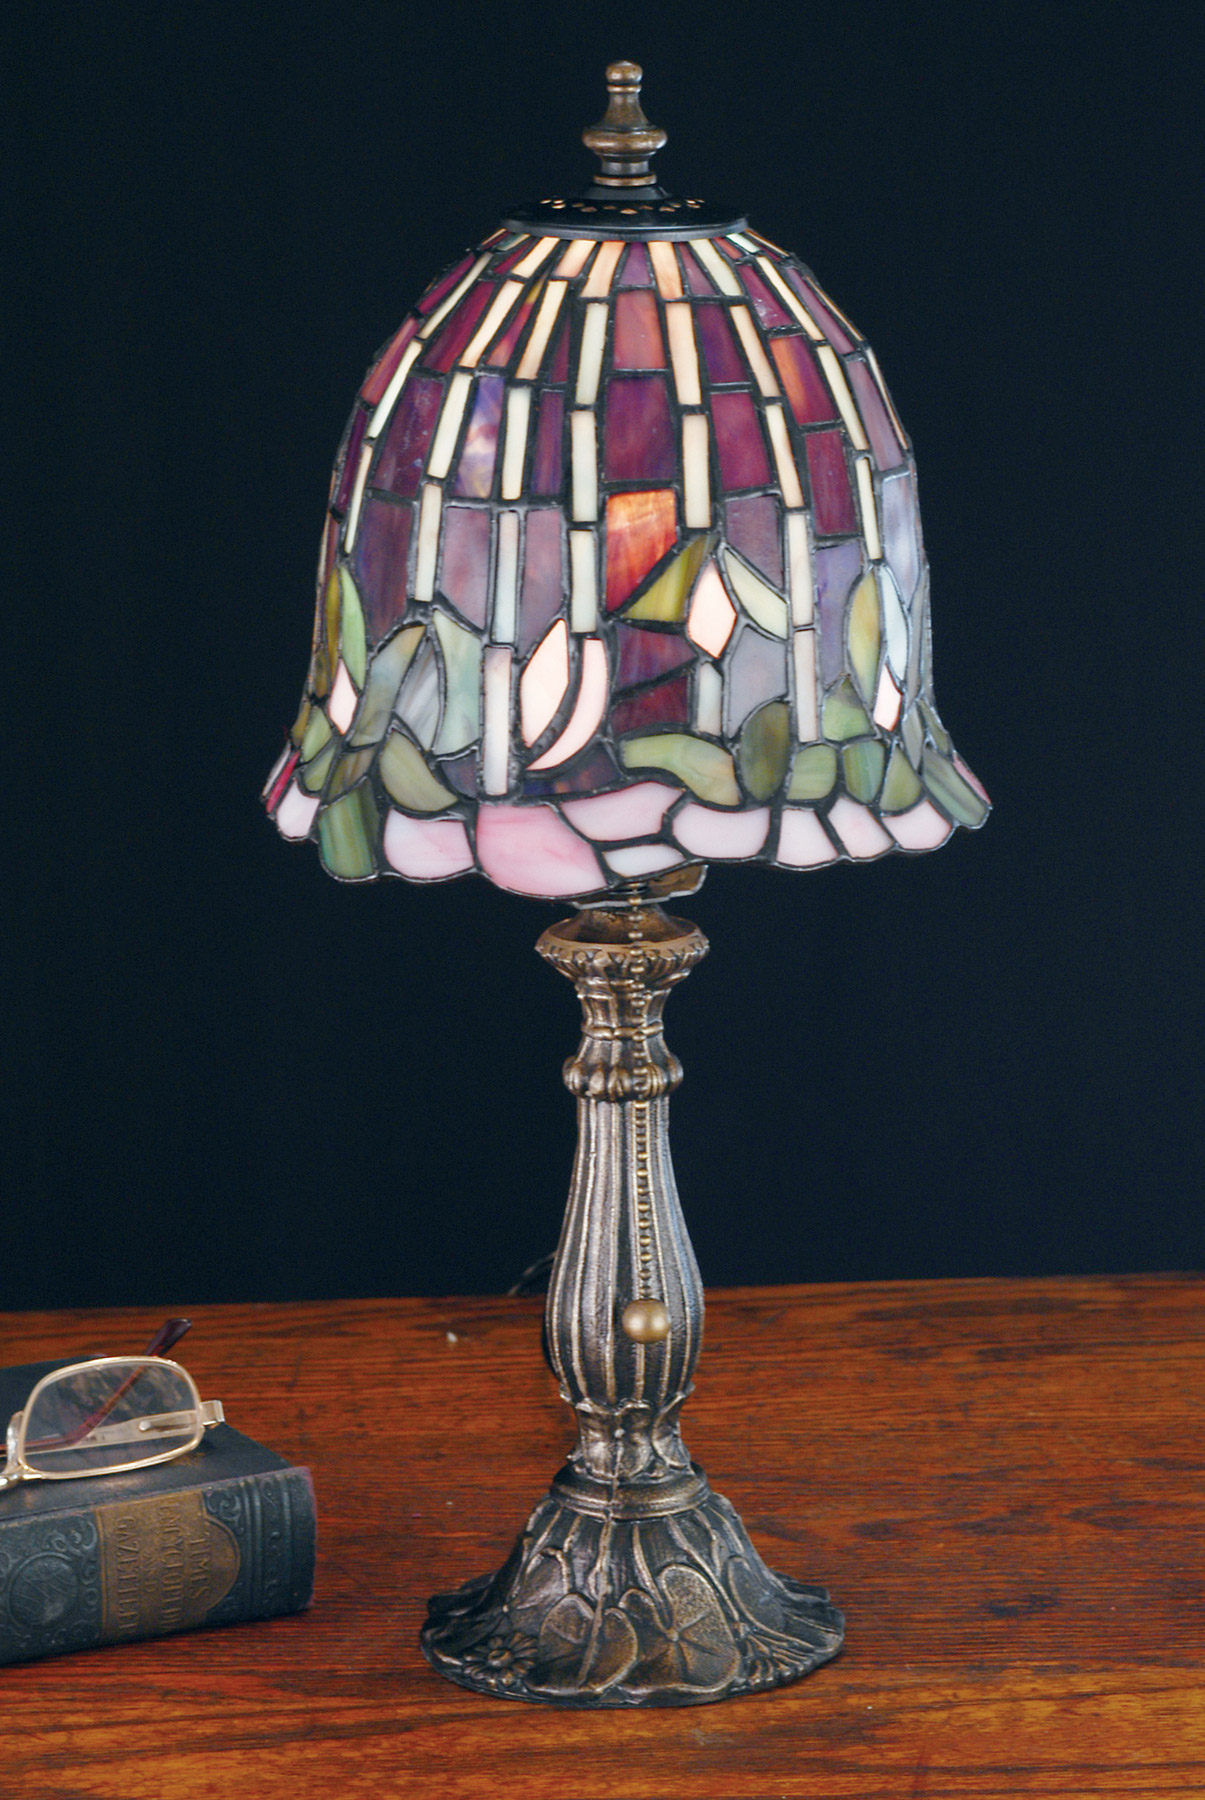 Meyda 26647 Tiffany Flowering Lotus Accent Lamp